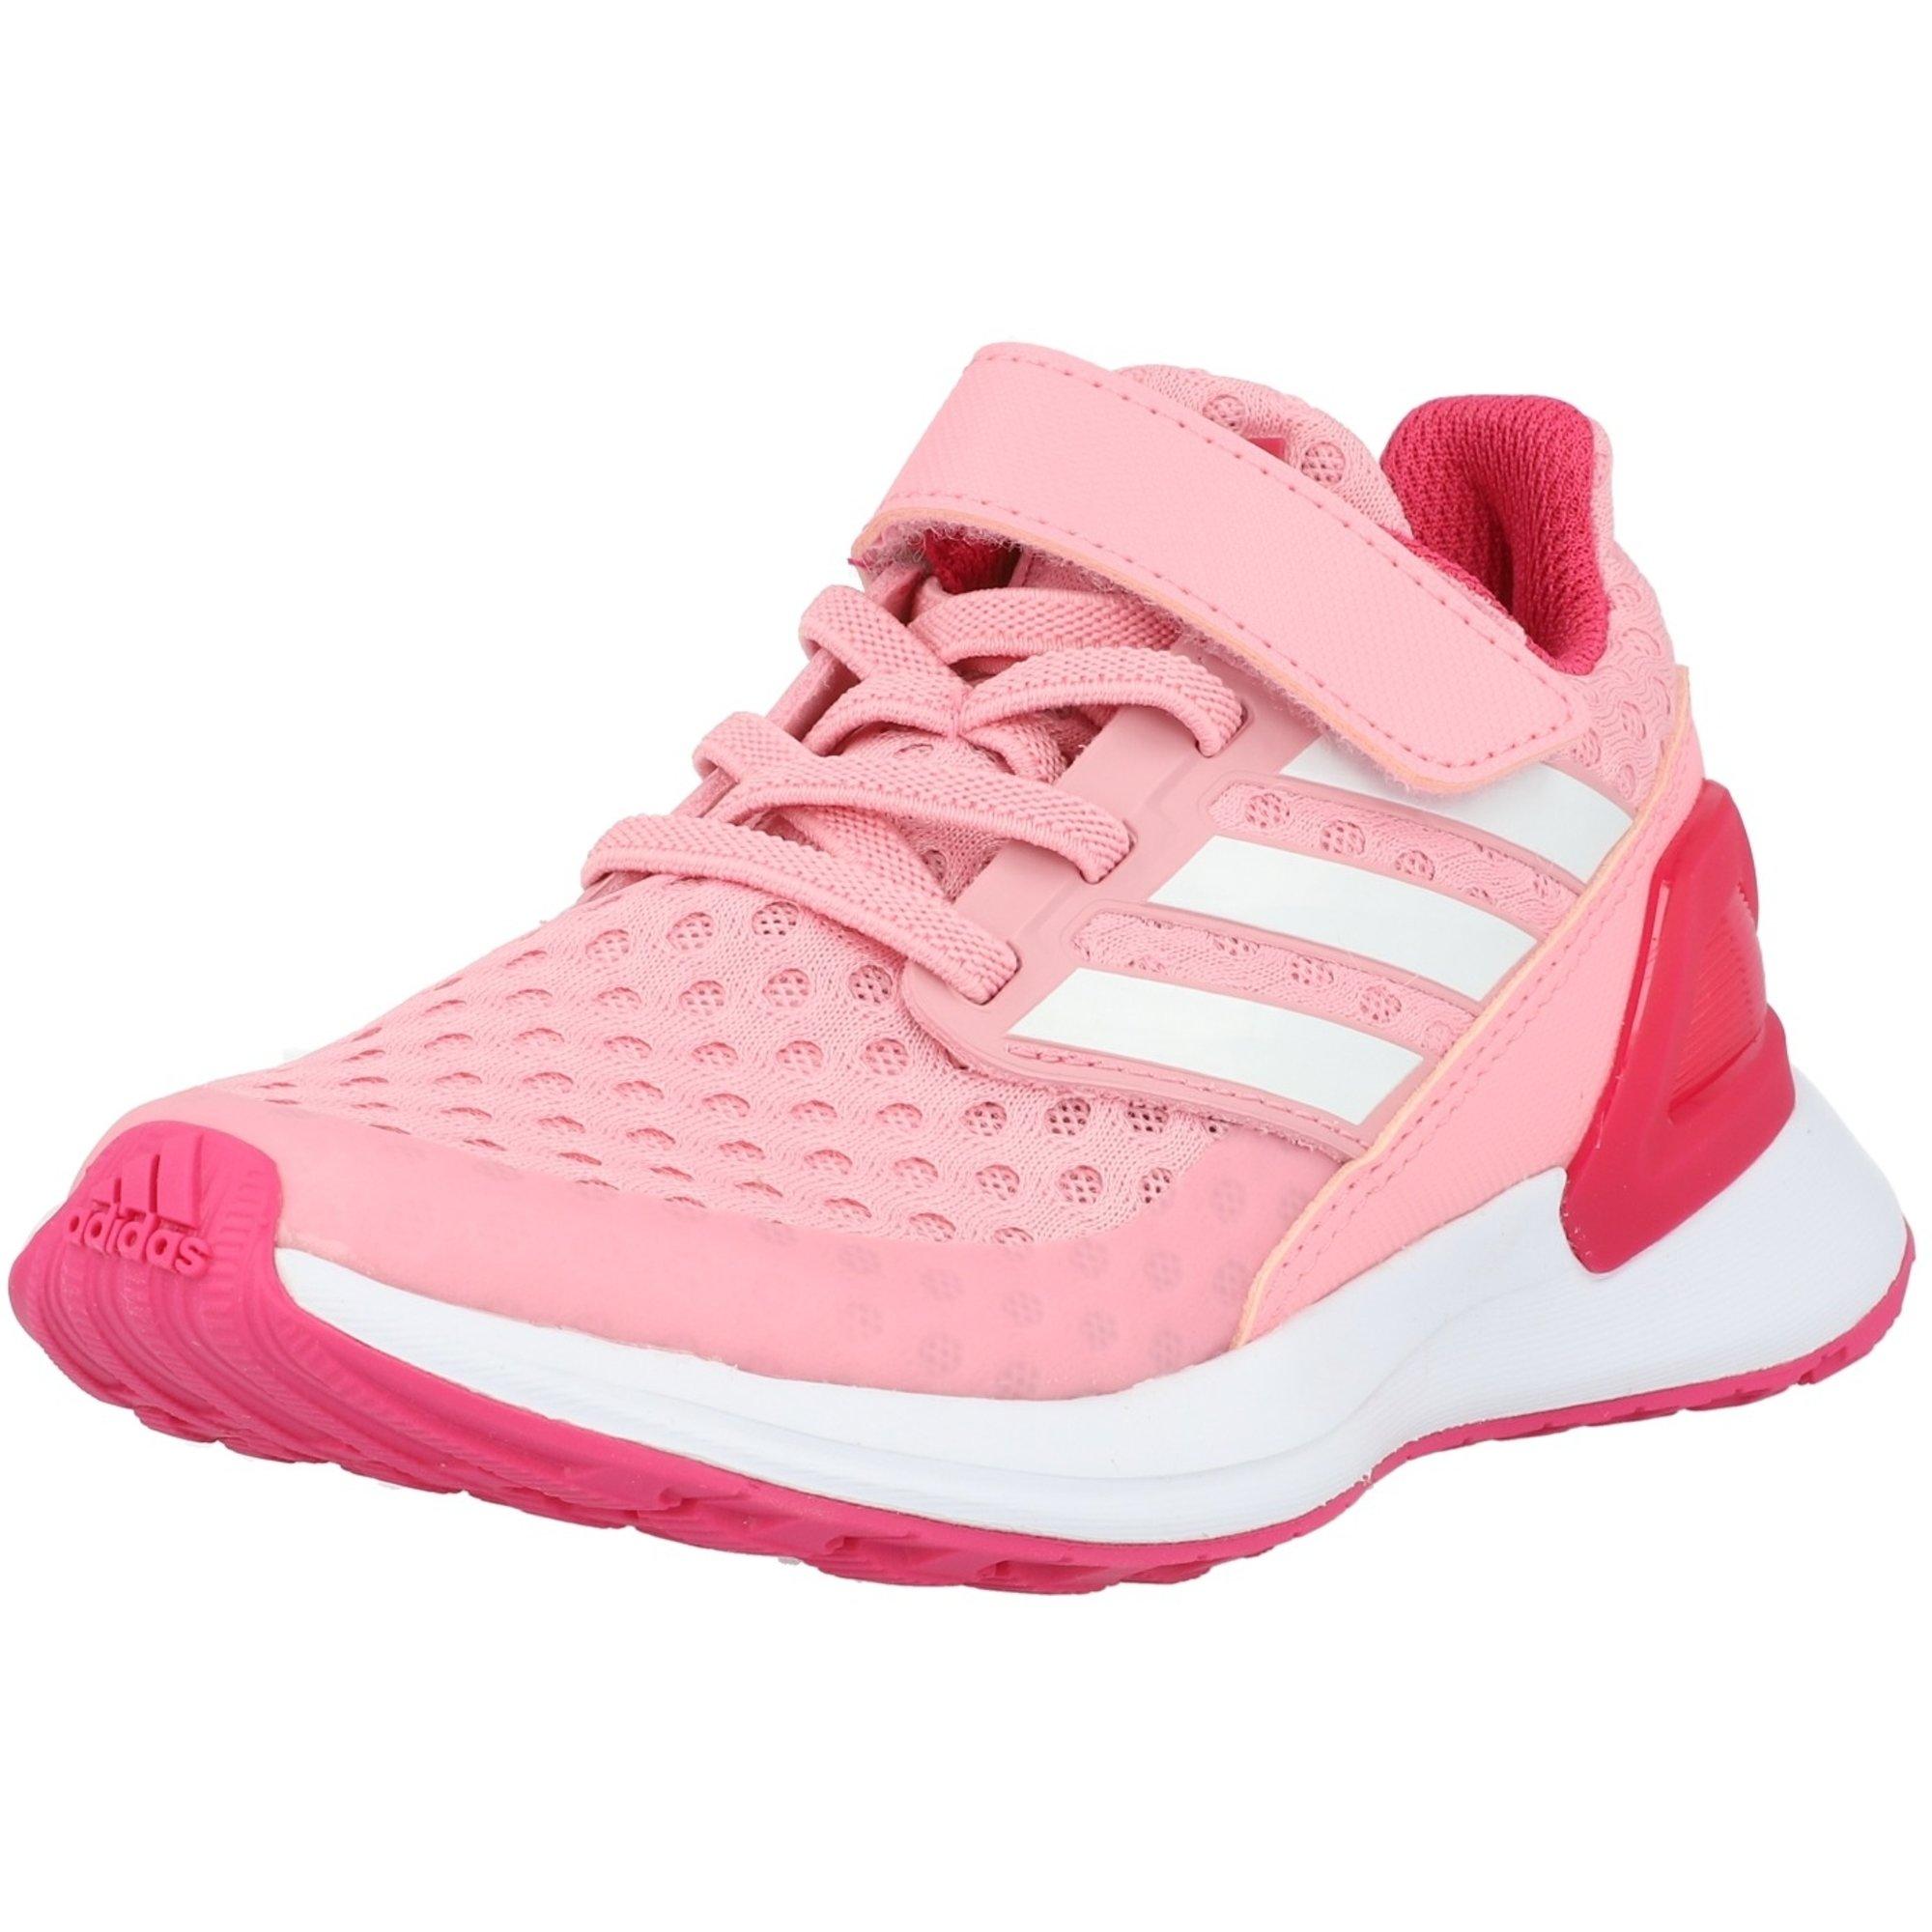 adidas RapidaRun EL K Light Pink